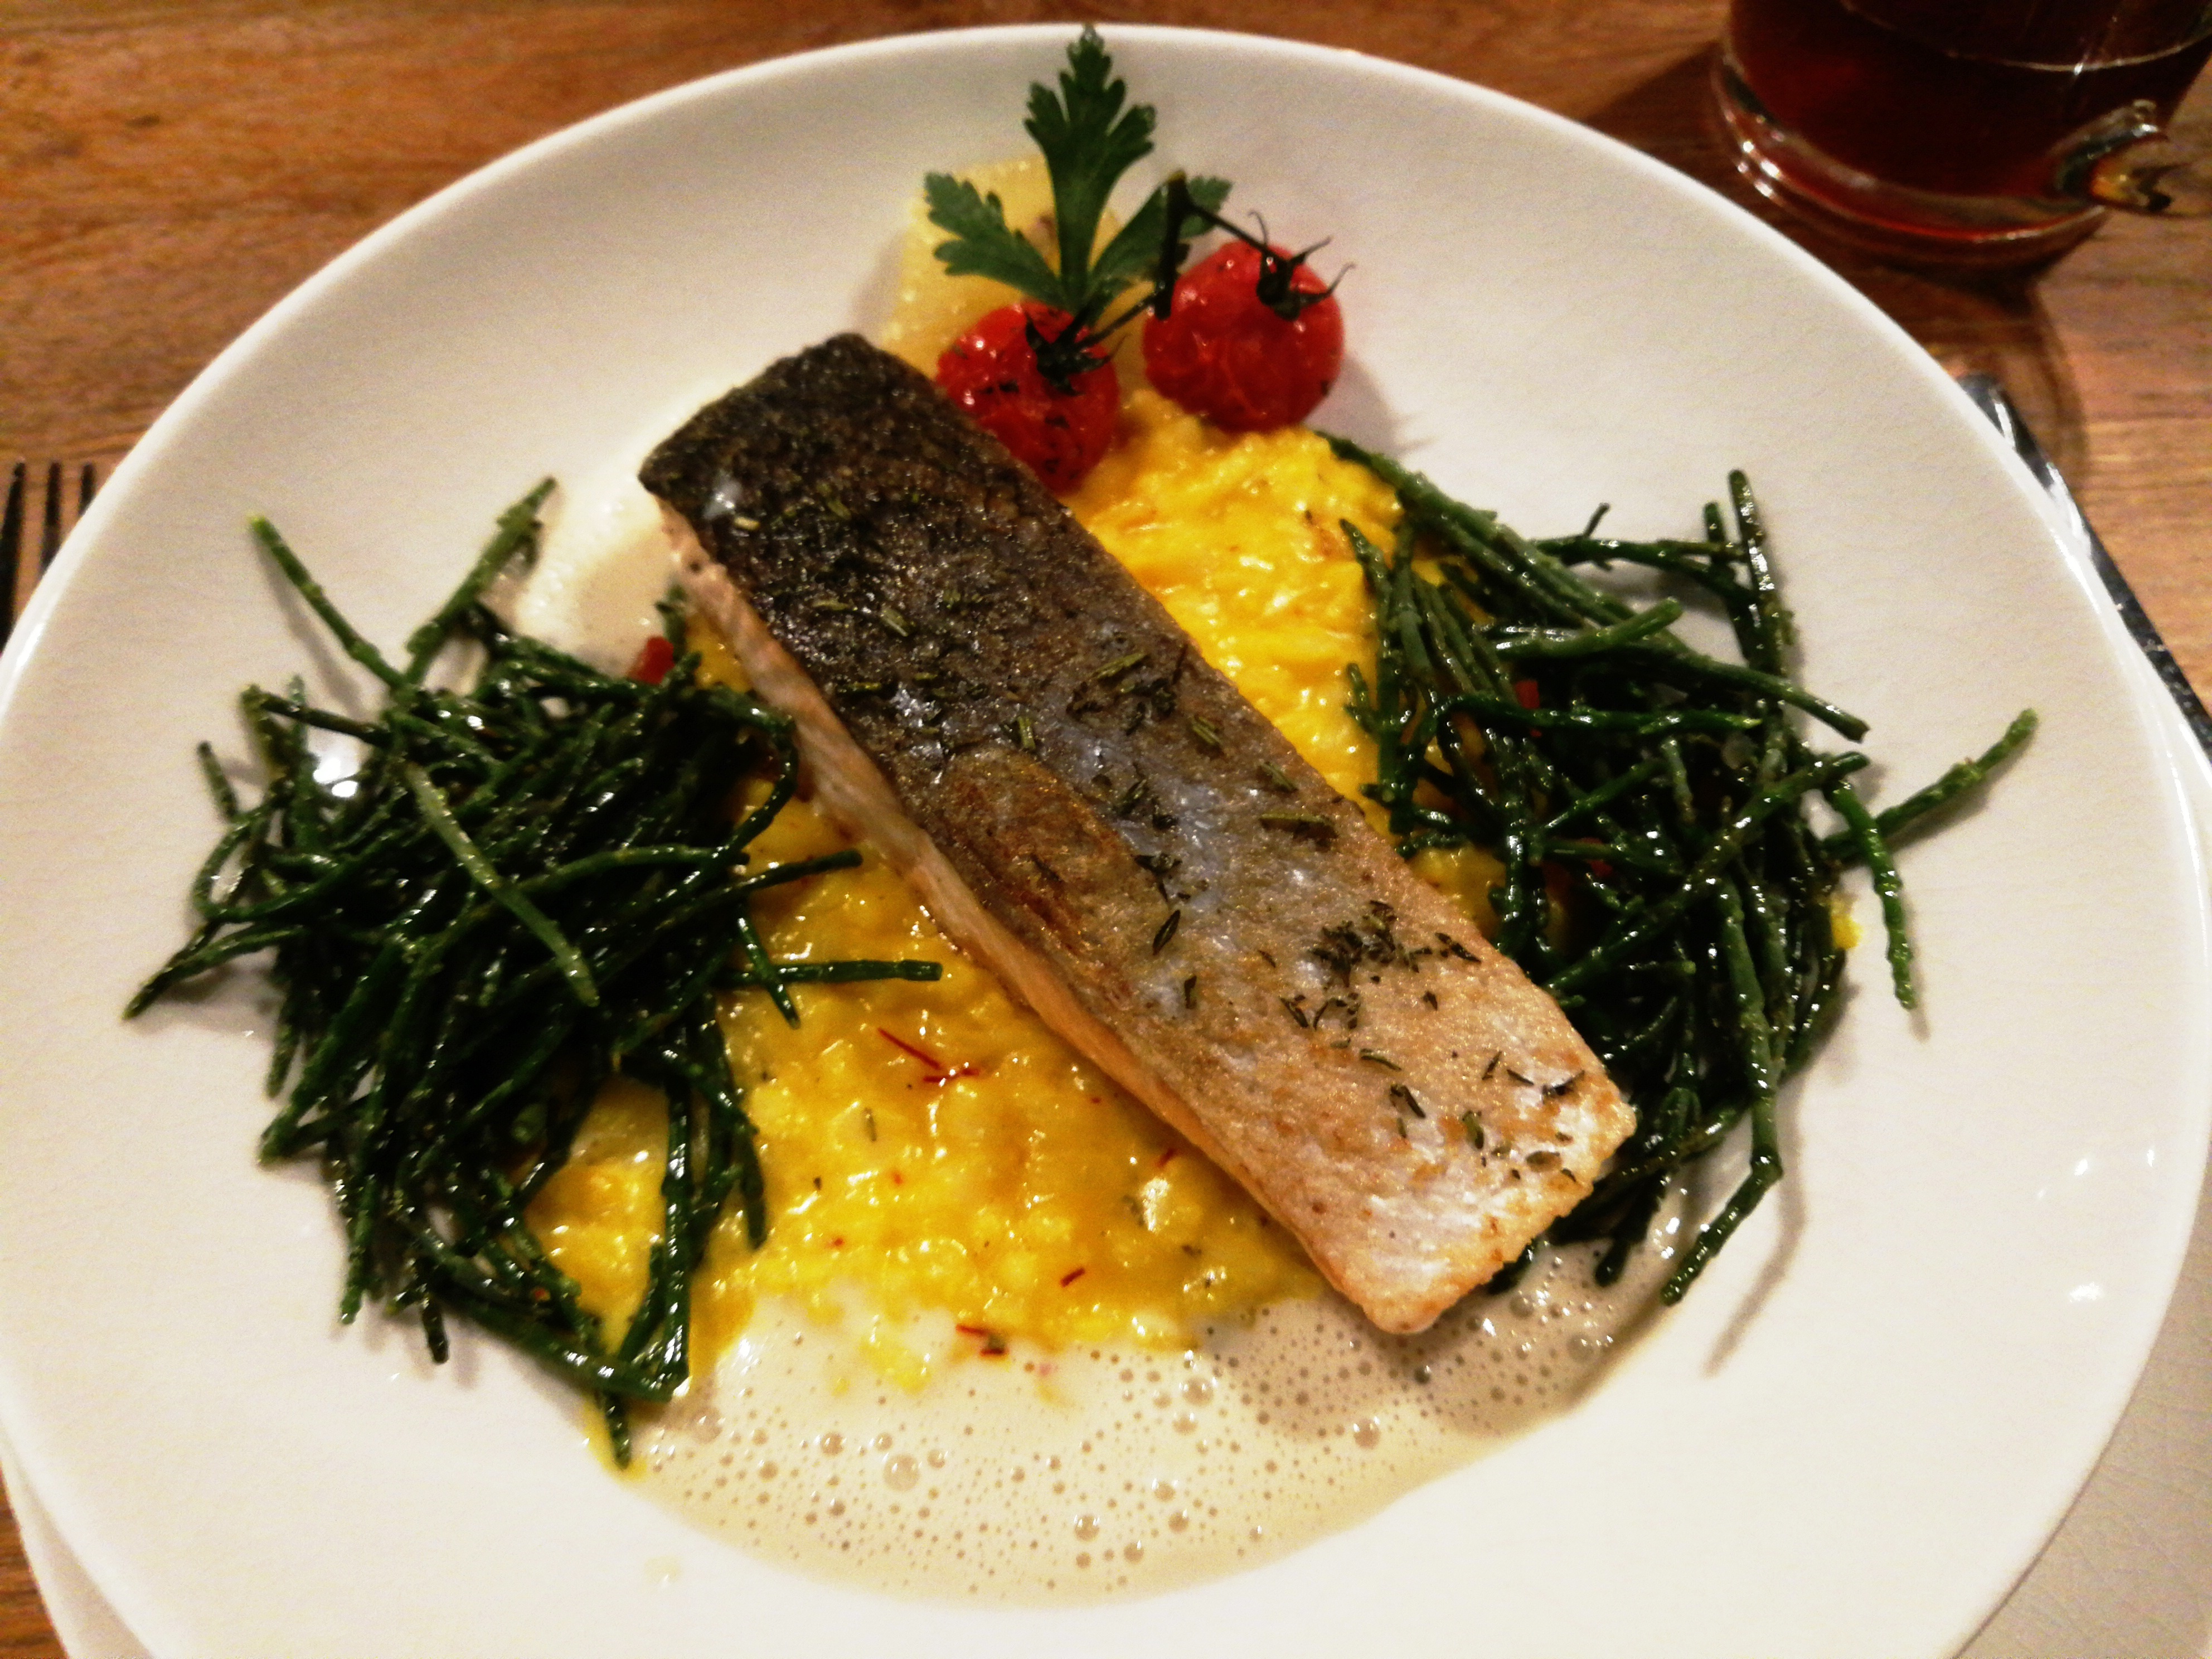 Freaky Fish Fridays im Lifestyle-Hotel SAND am Timmendorfer Strand